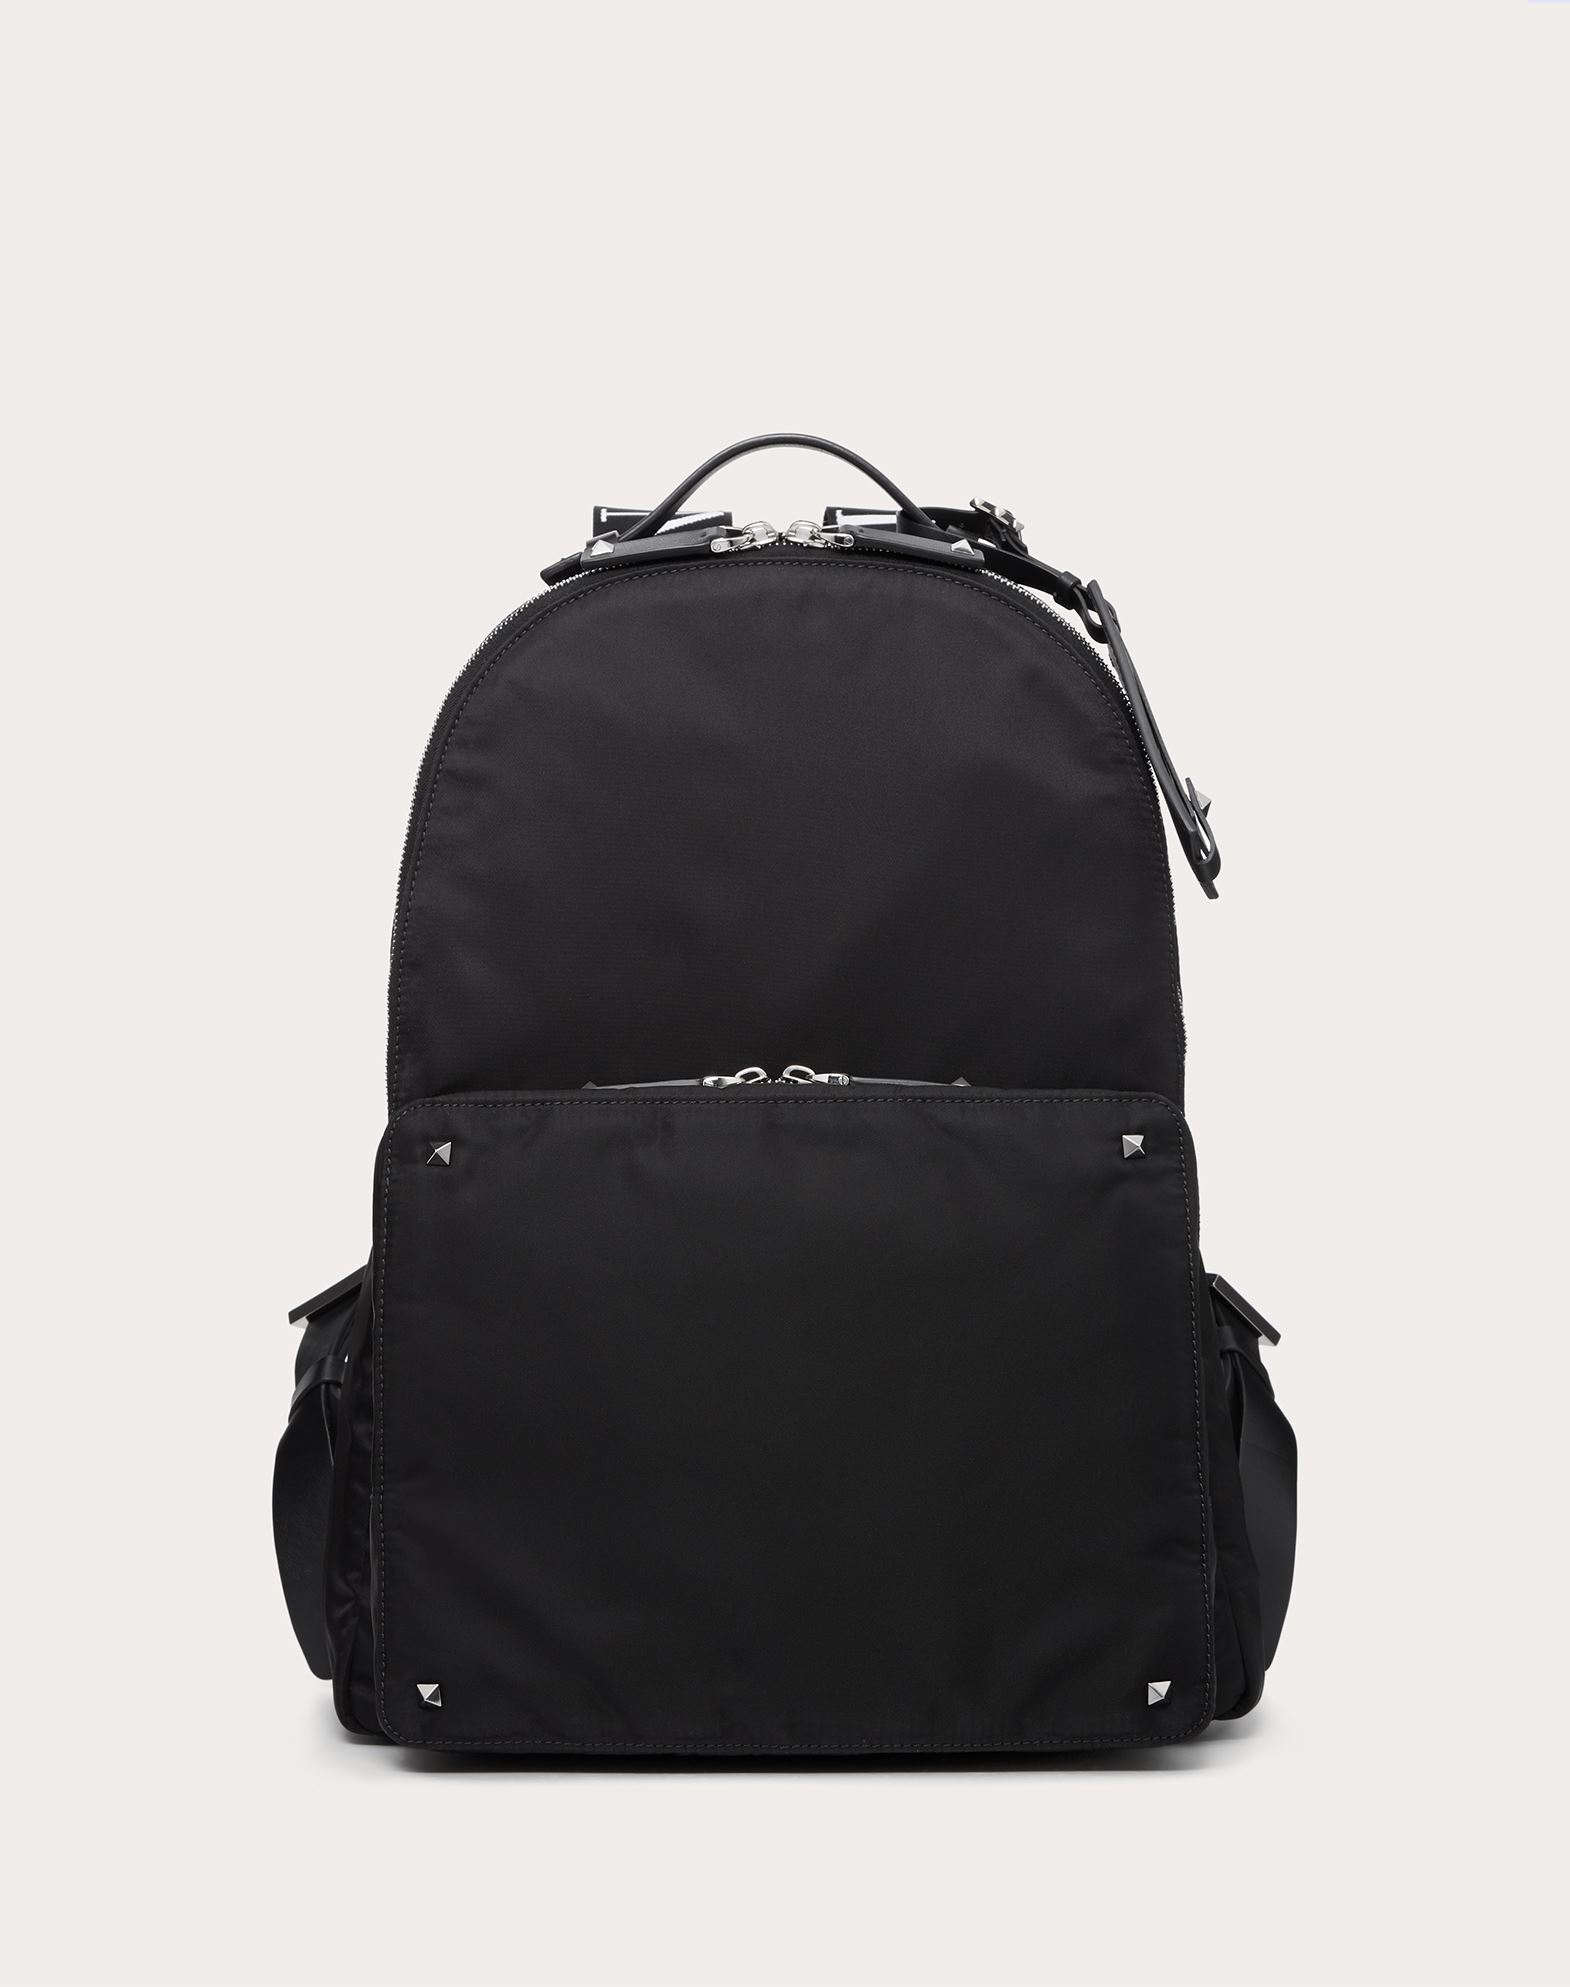 VALENTINO Techno fabric Studs Logo Solid colour Dual zip closure External pockets Internal pocket  45409581ew